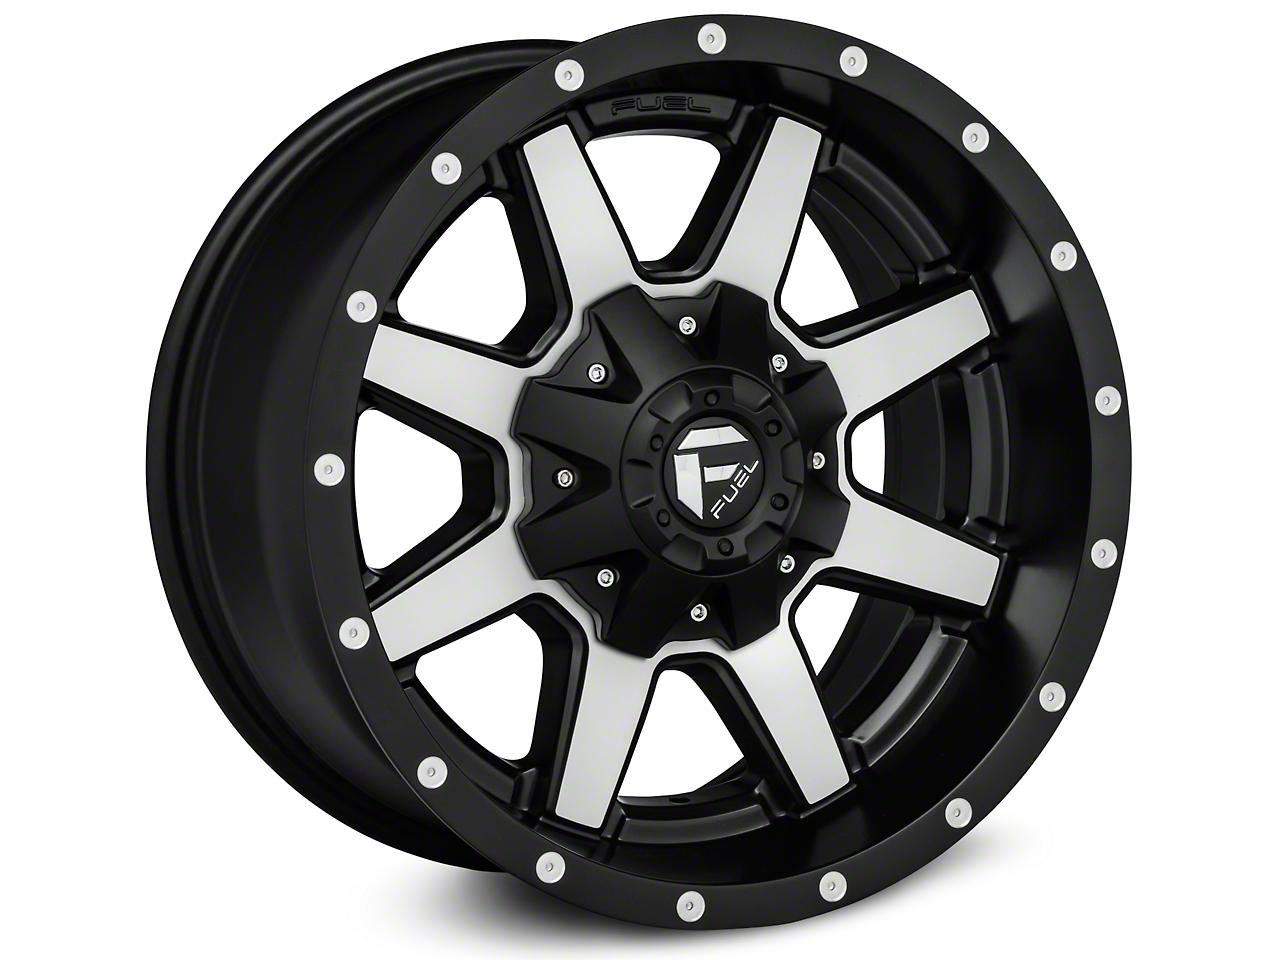 Fuel Wheels Maverick Black Machined Wheels (07-18 Wrangler JK; 2018 Wrangler JL)